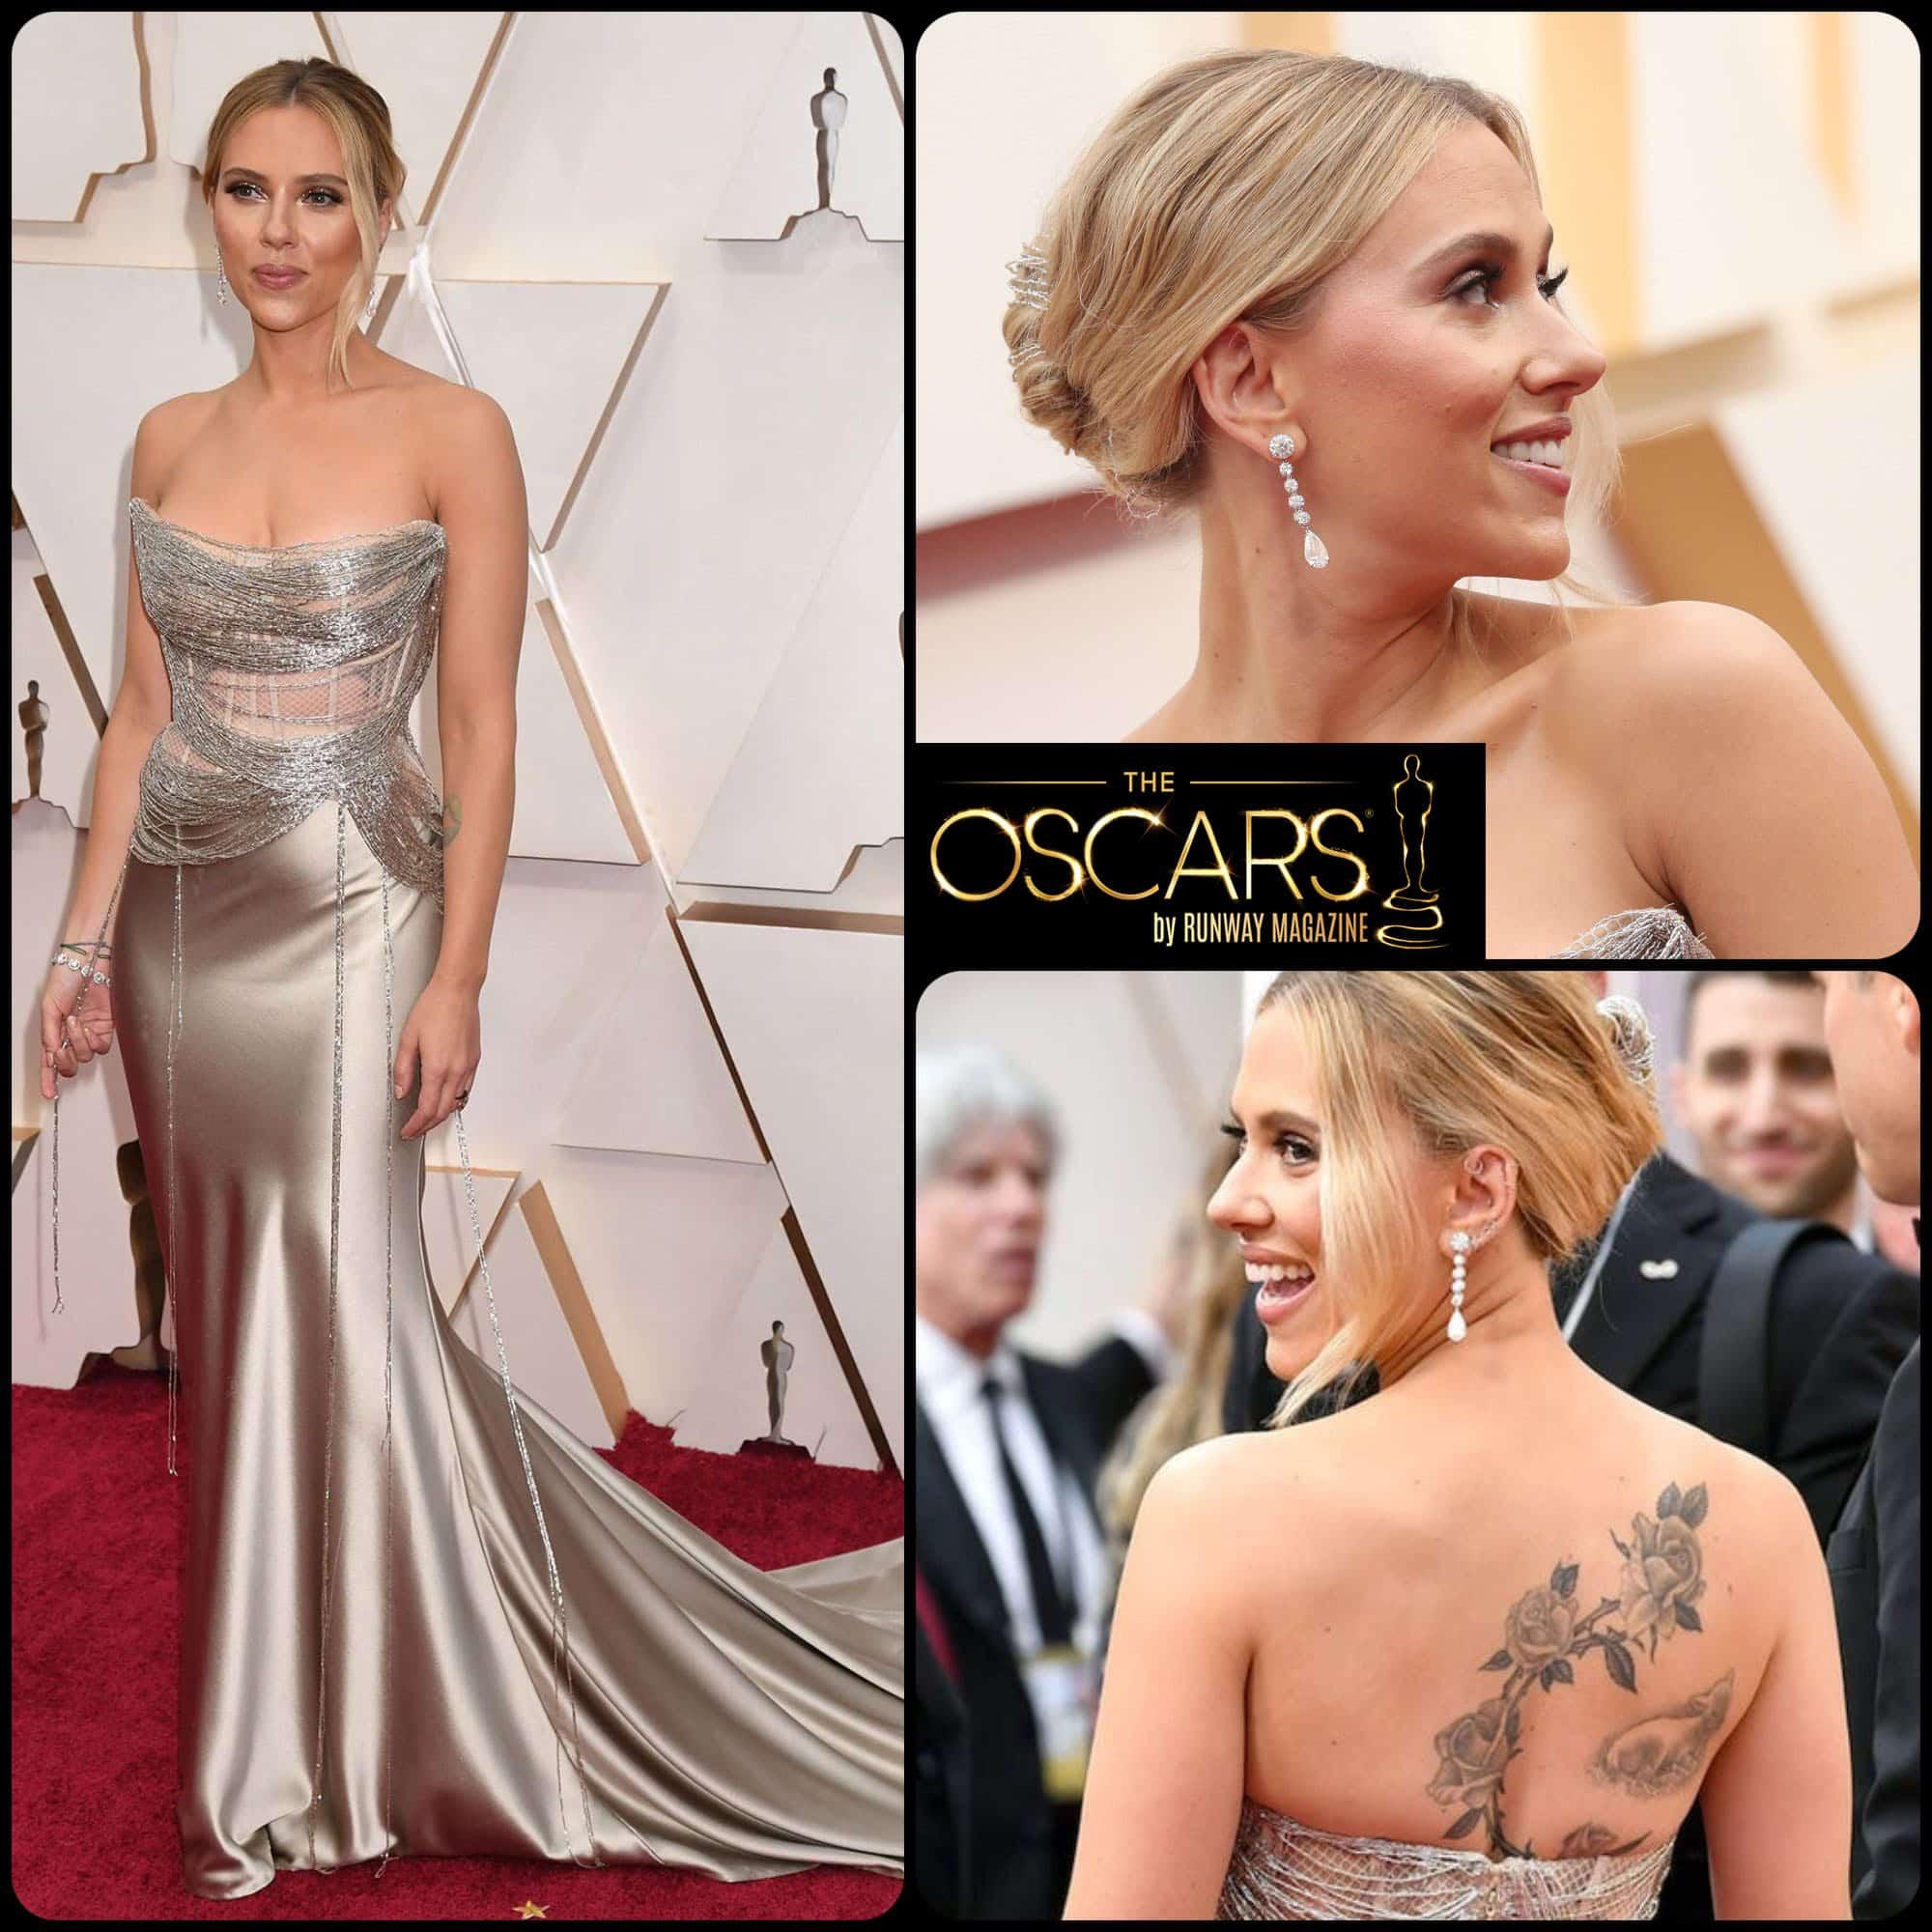 Scarlett Johansson in Oscar de la Renta at the 2020 Oscars by RUNWAY MAGAZINE